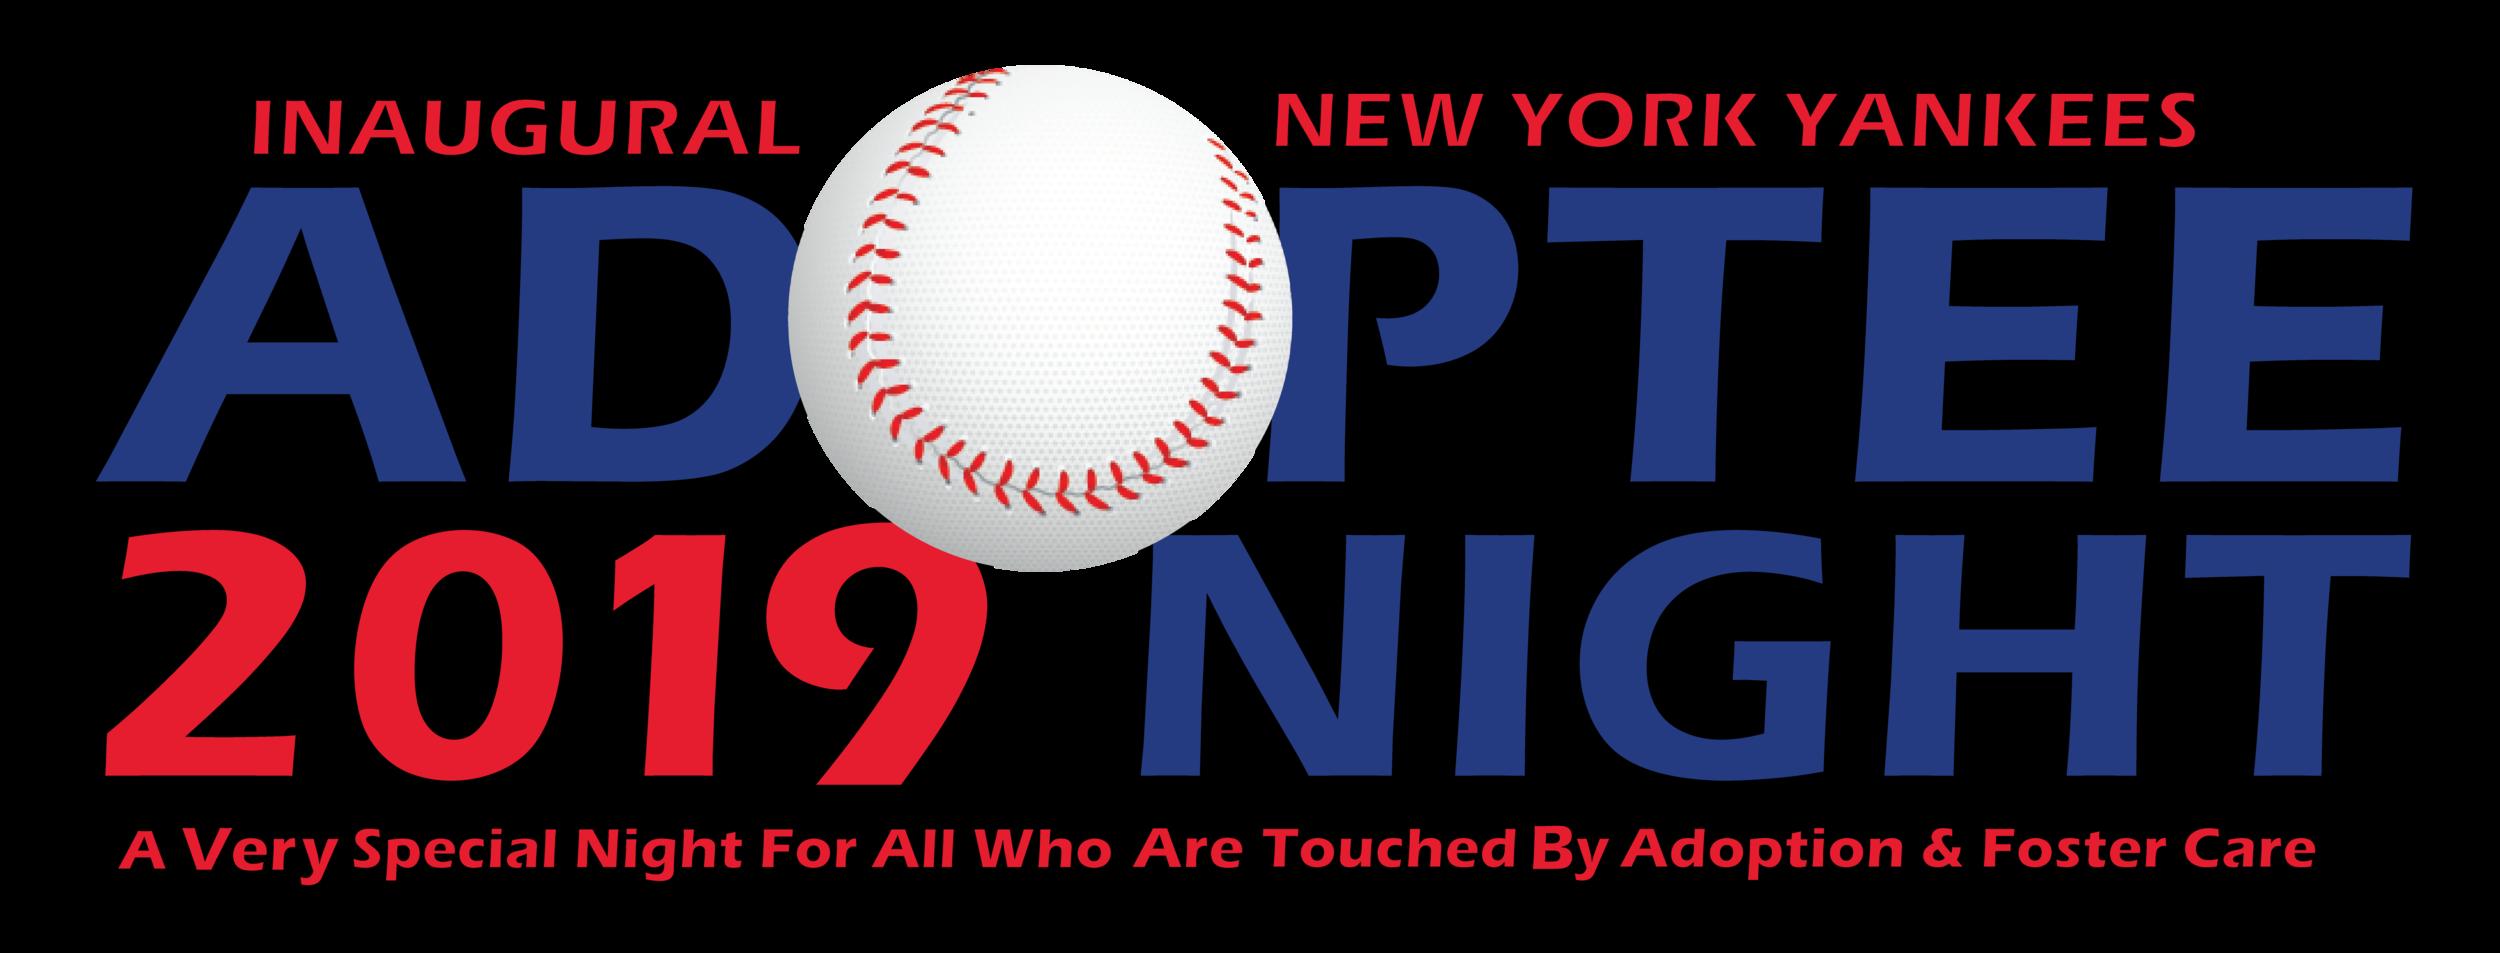 New York Yankees_outlineBLACK-01.png